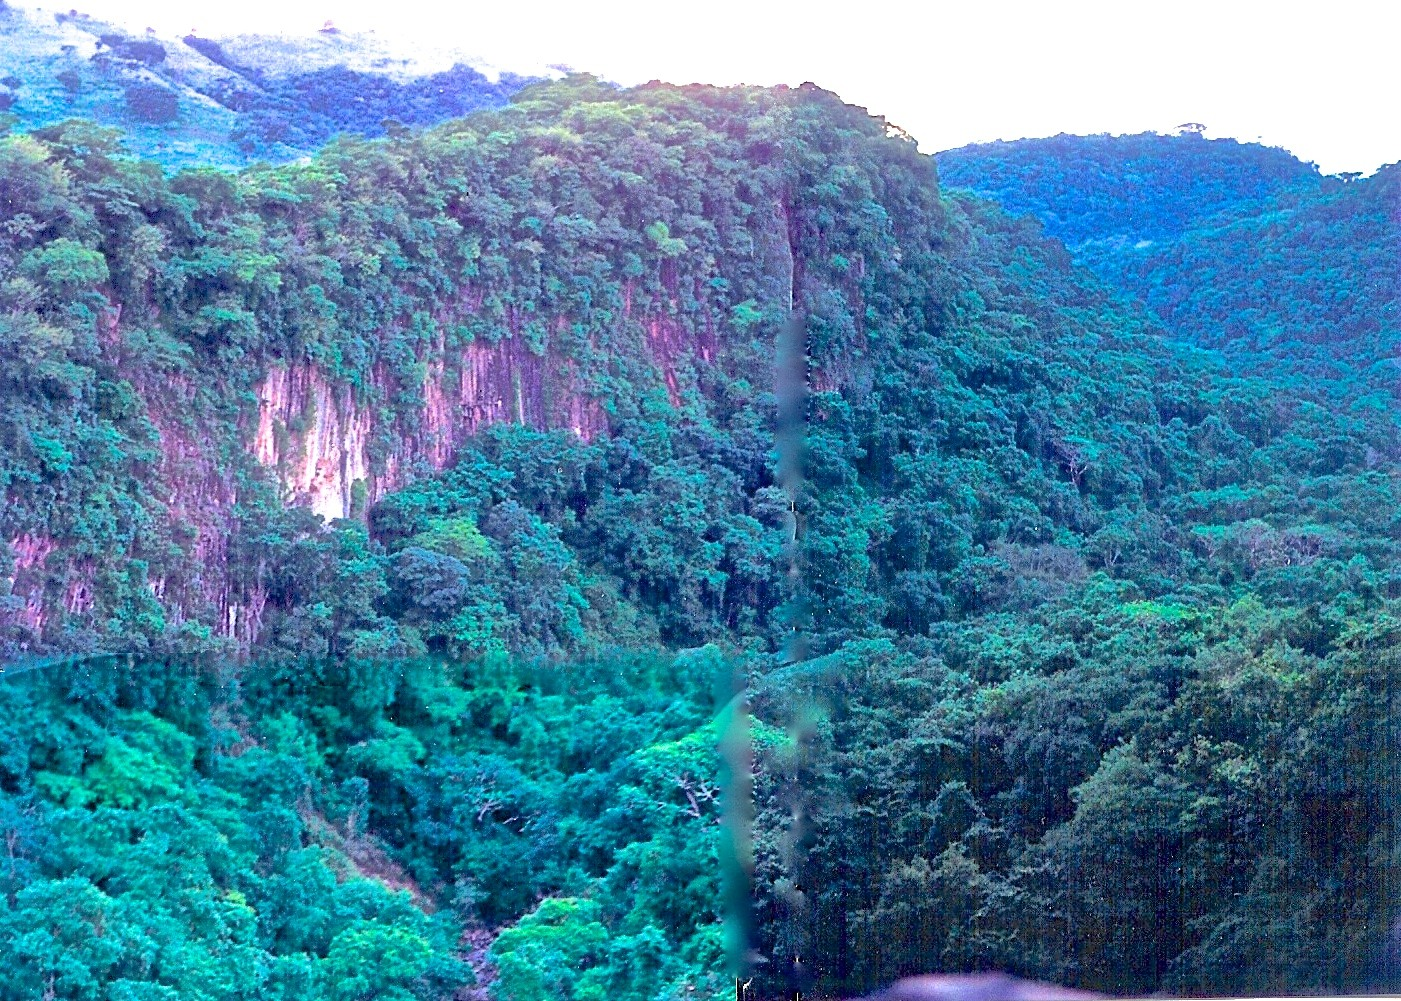 Canyon cliffs